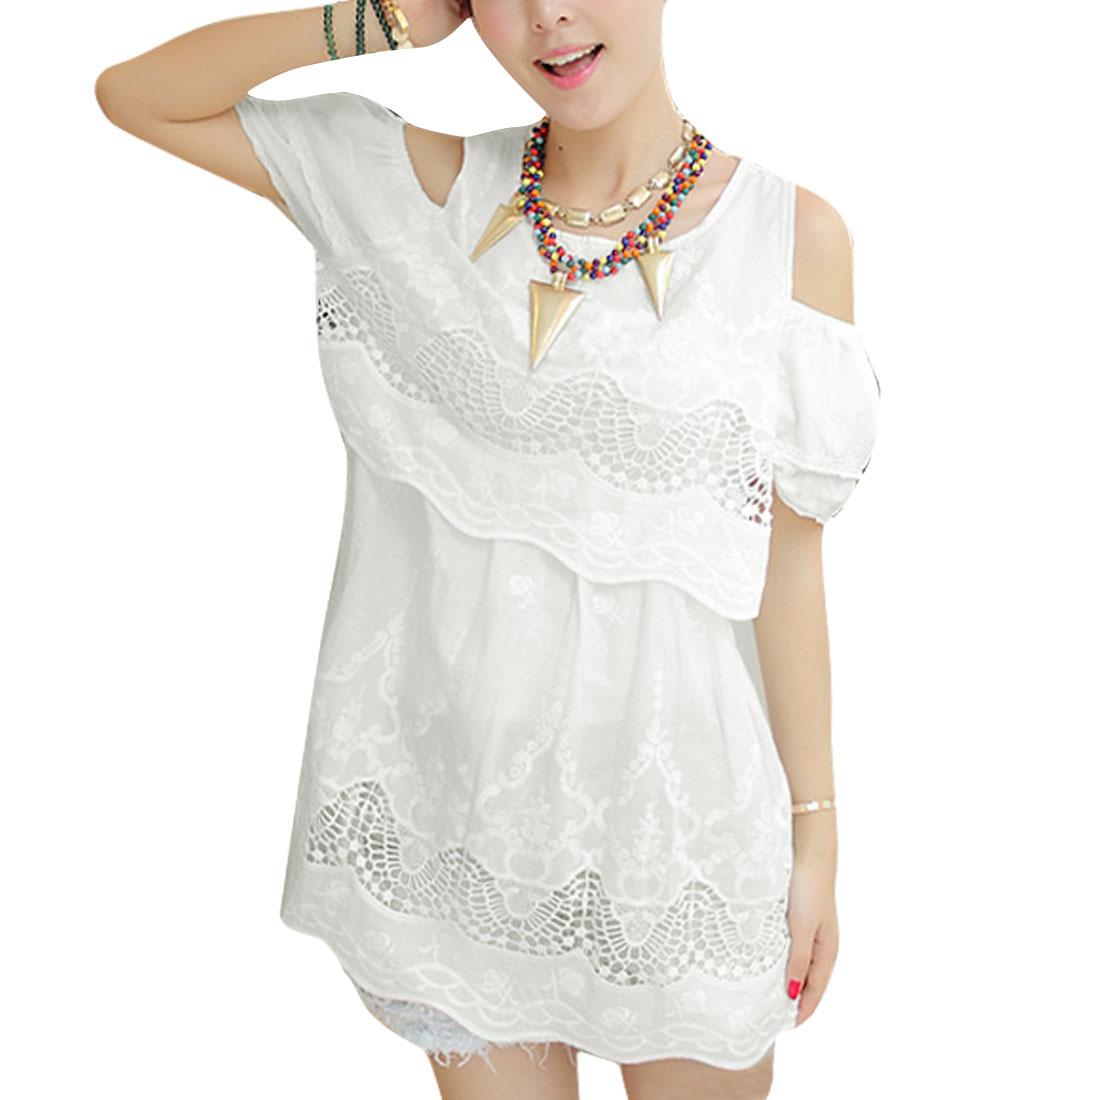 Women S White Off Shoulder Design Round Neck Semi Sheer Pullover Dress